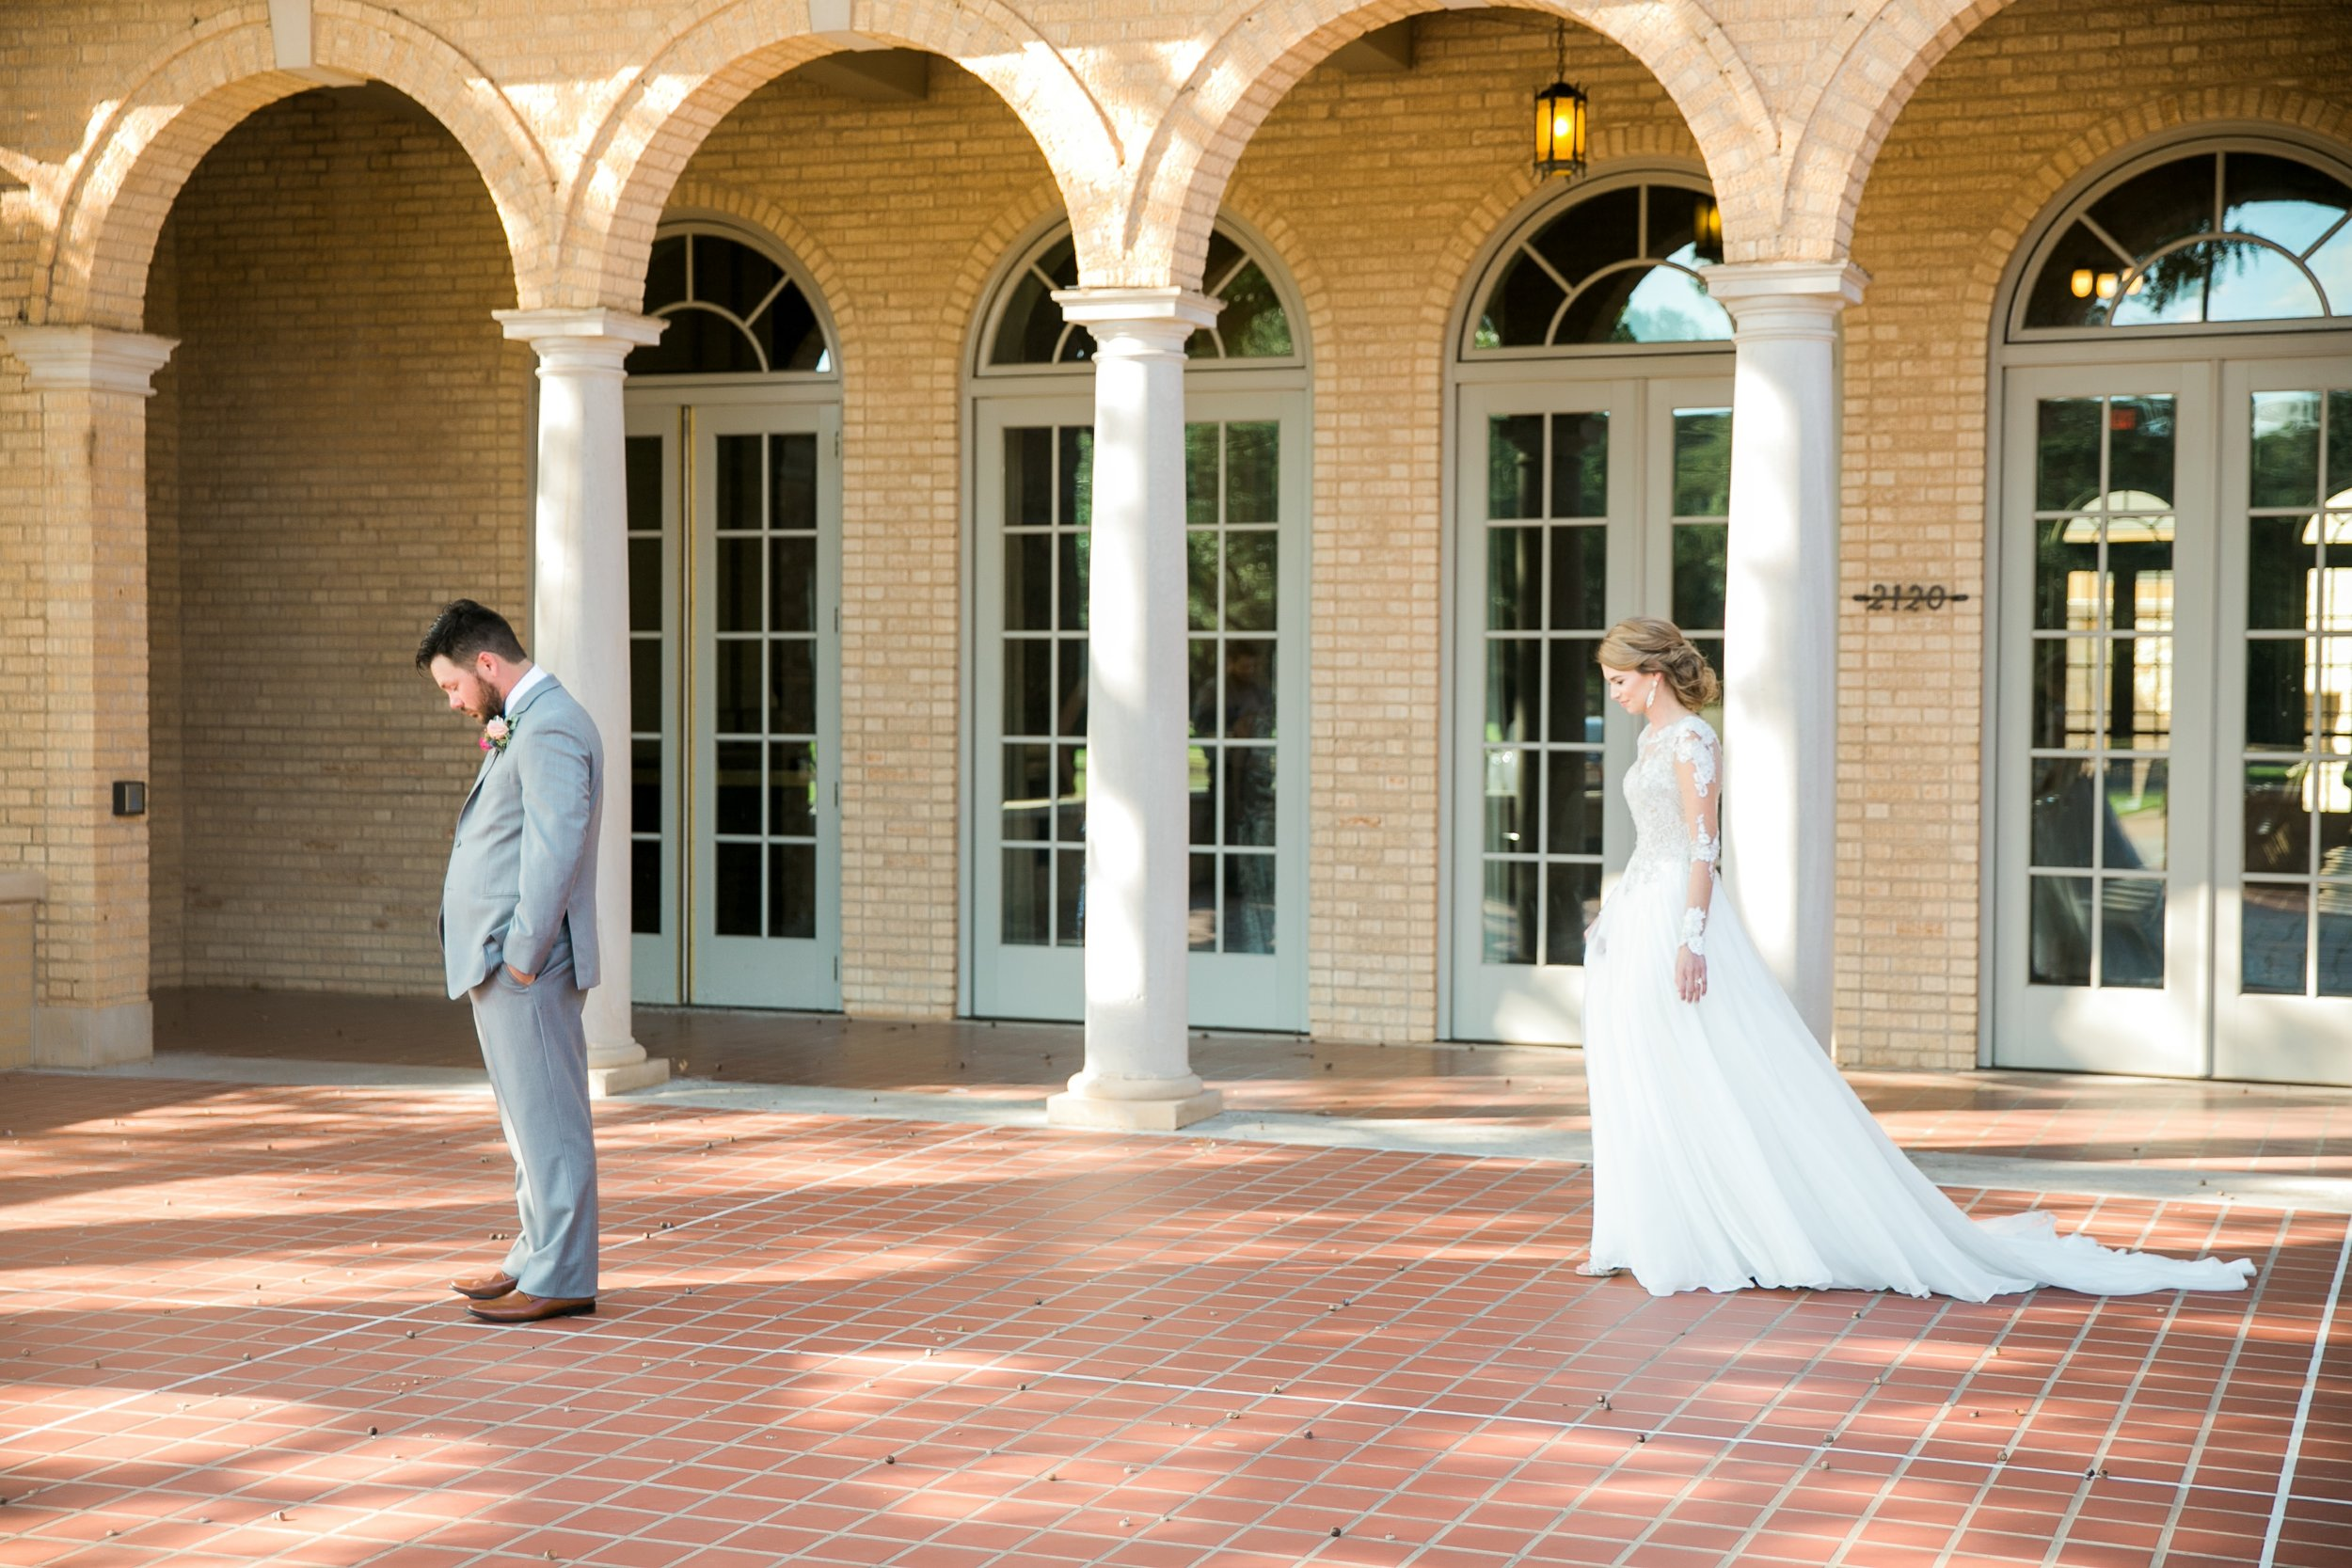 Roberson-Wedding-The-Forum-Lauren-Pinson-Wedding-Photography-Wichita-Falls-Texas-025.jpg